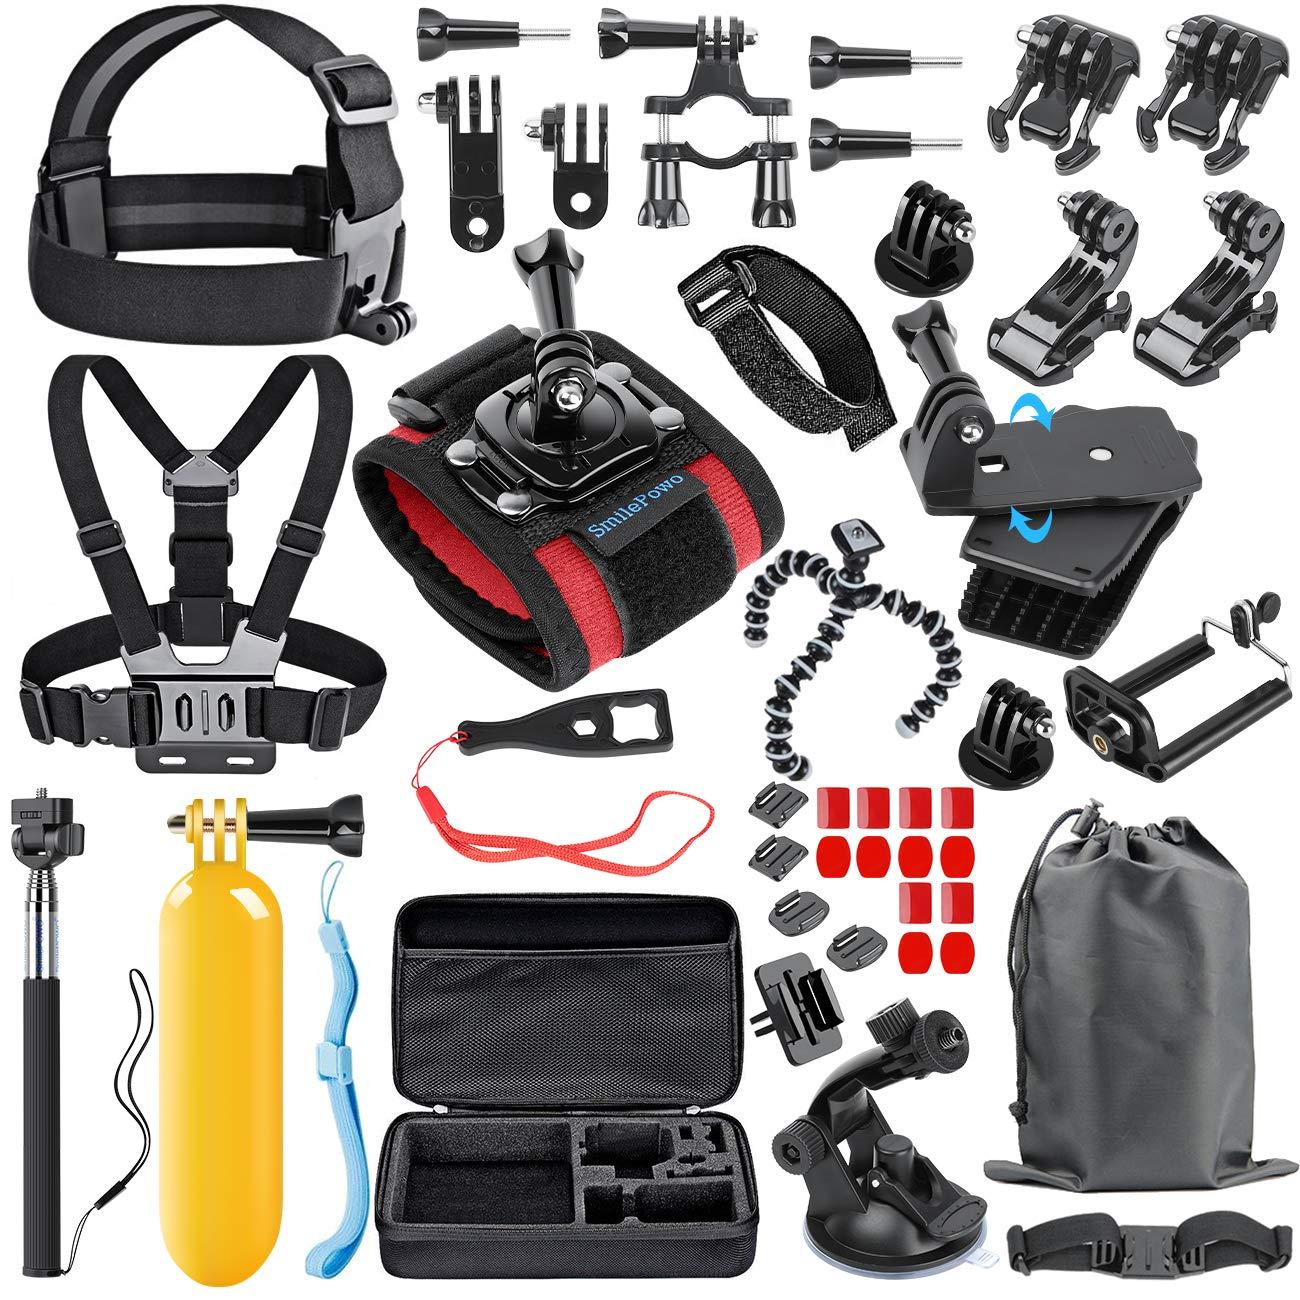 SmilePowo Accessory Kit for GoPro Hero 7,6,5 Black, Hero 2018,Hero Session,5,4,3,GoPro Fusion, SJCAN,XIAOMI,AKASO/APEMAN/ DBPOWER,Lightdow,Campark,Action Camera Accessory Kit,Chest Strap,Float Handle